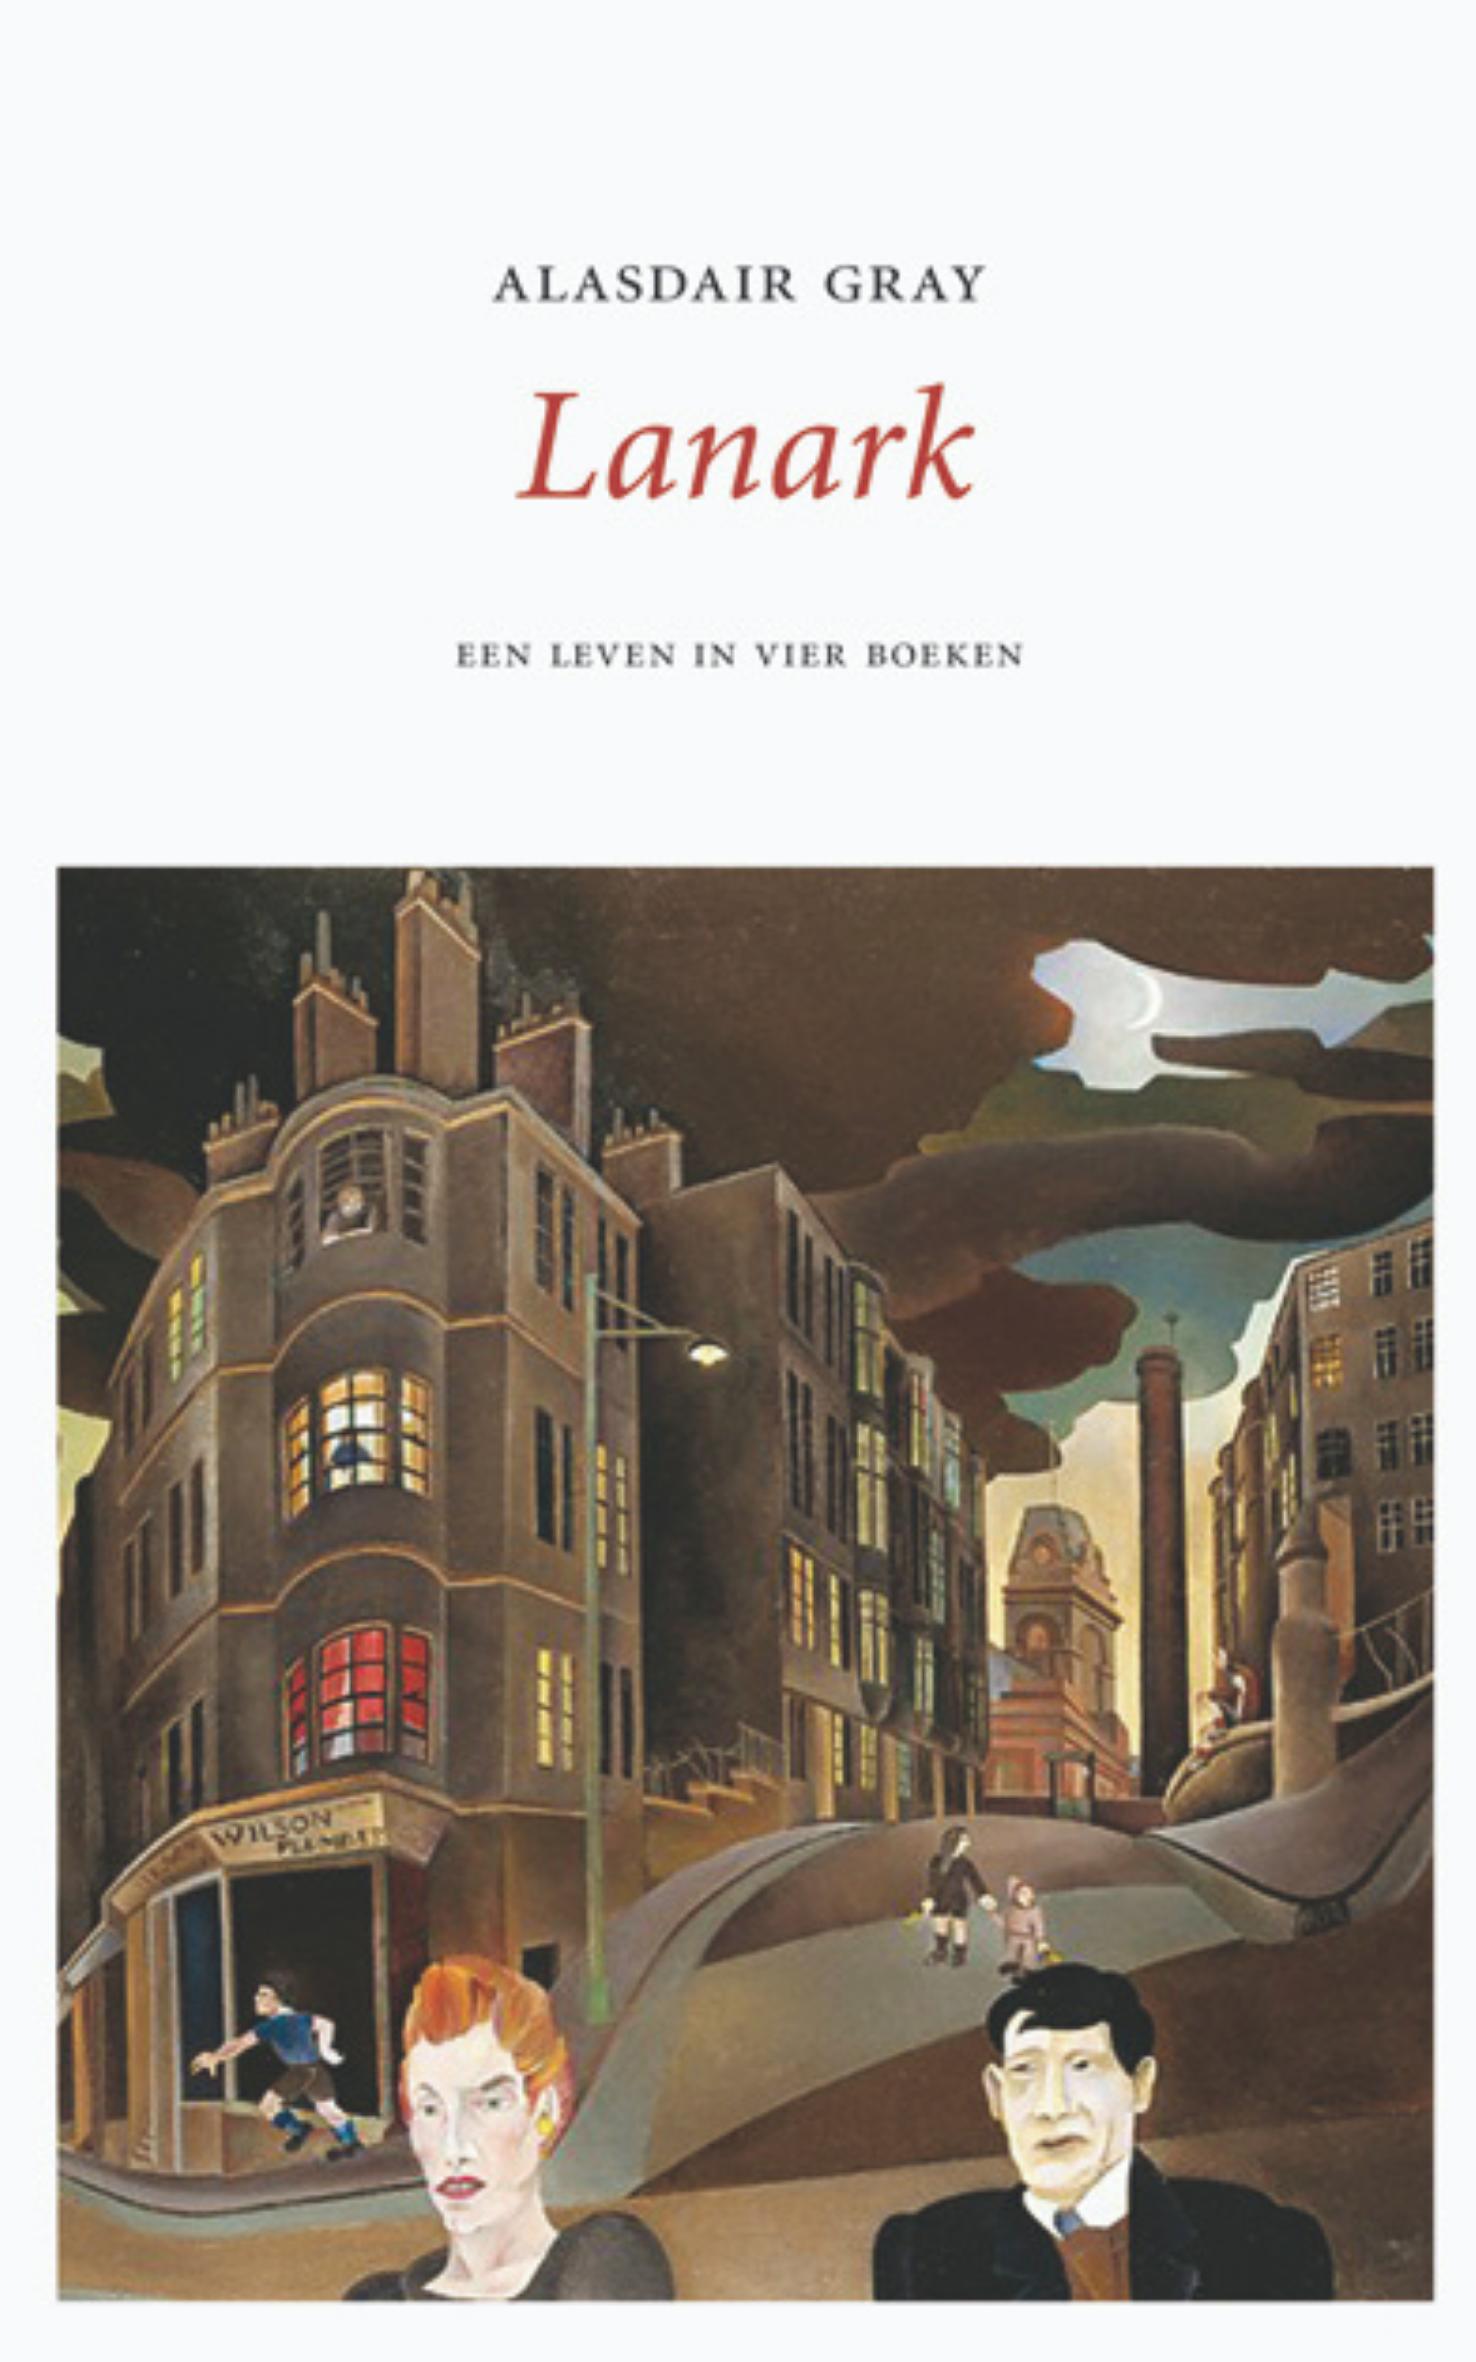 Lanark – Alasdair Gray